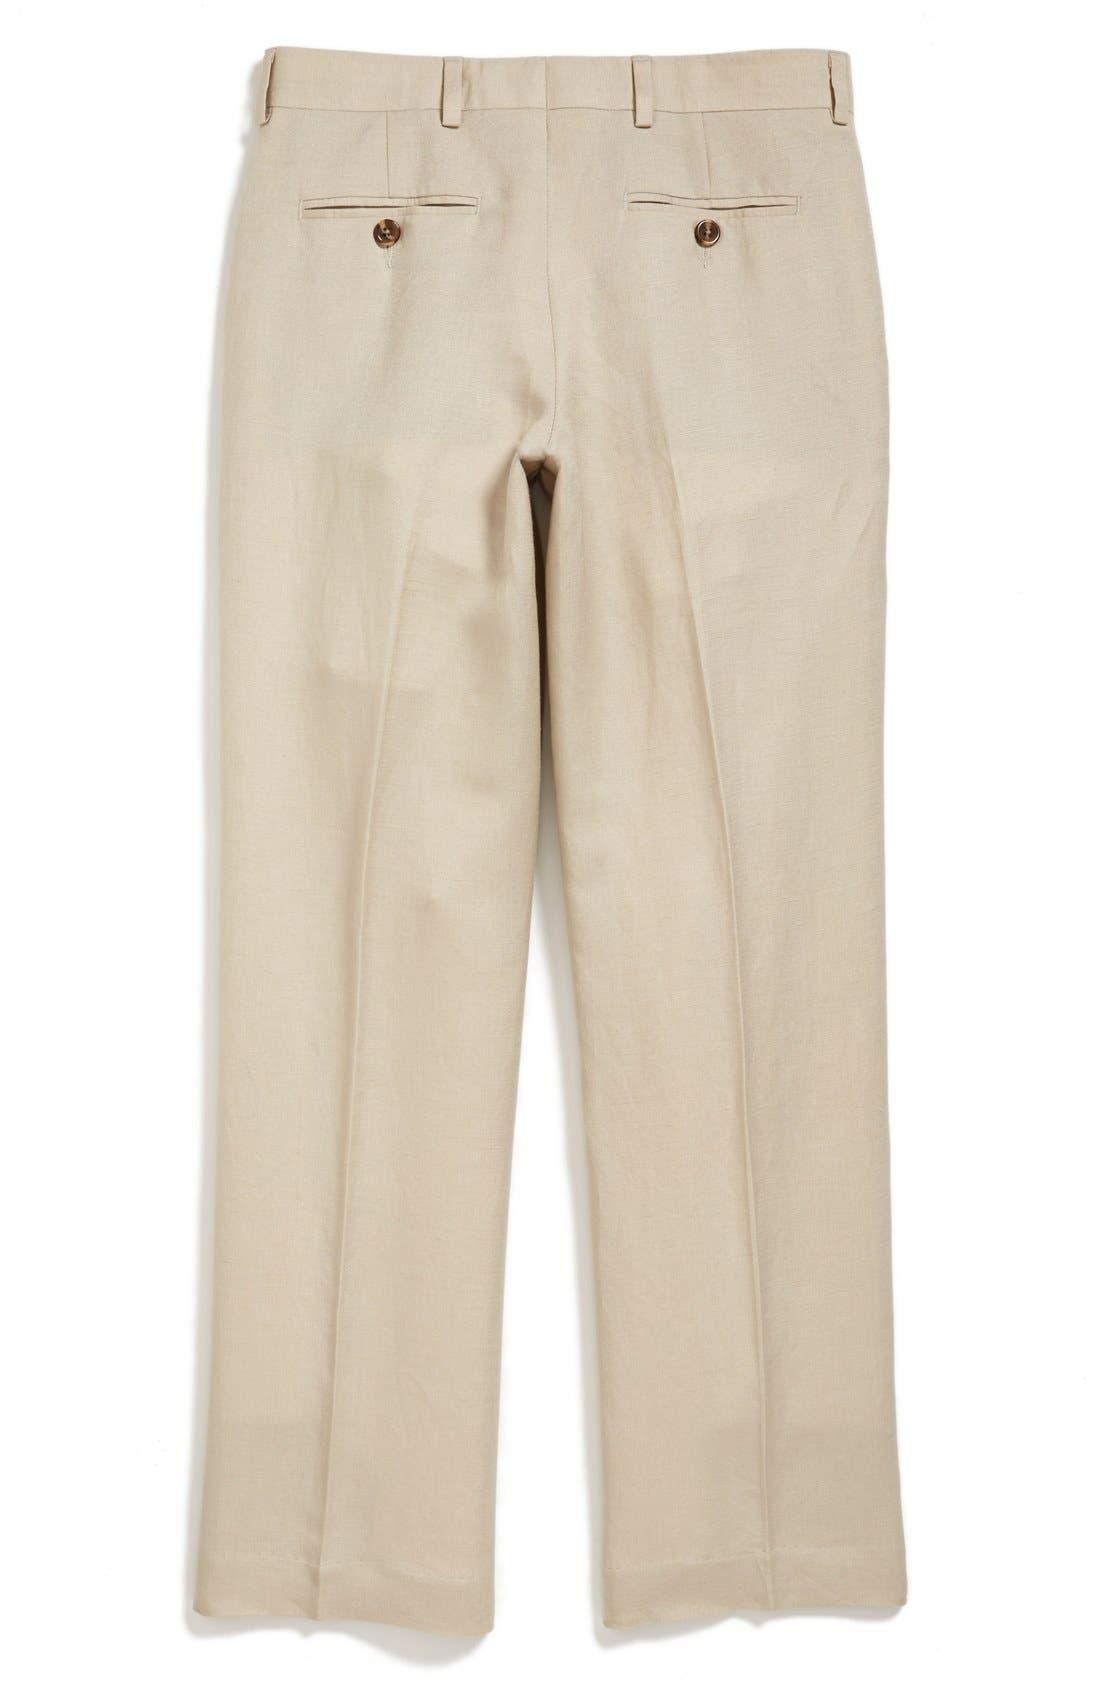 NORDSTROM,                             'Quentin' Linen Blend Trousers,                             Alternate thumbnail 2, color,                             250